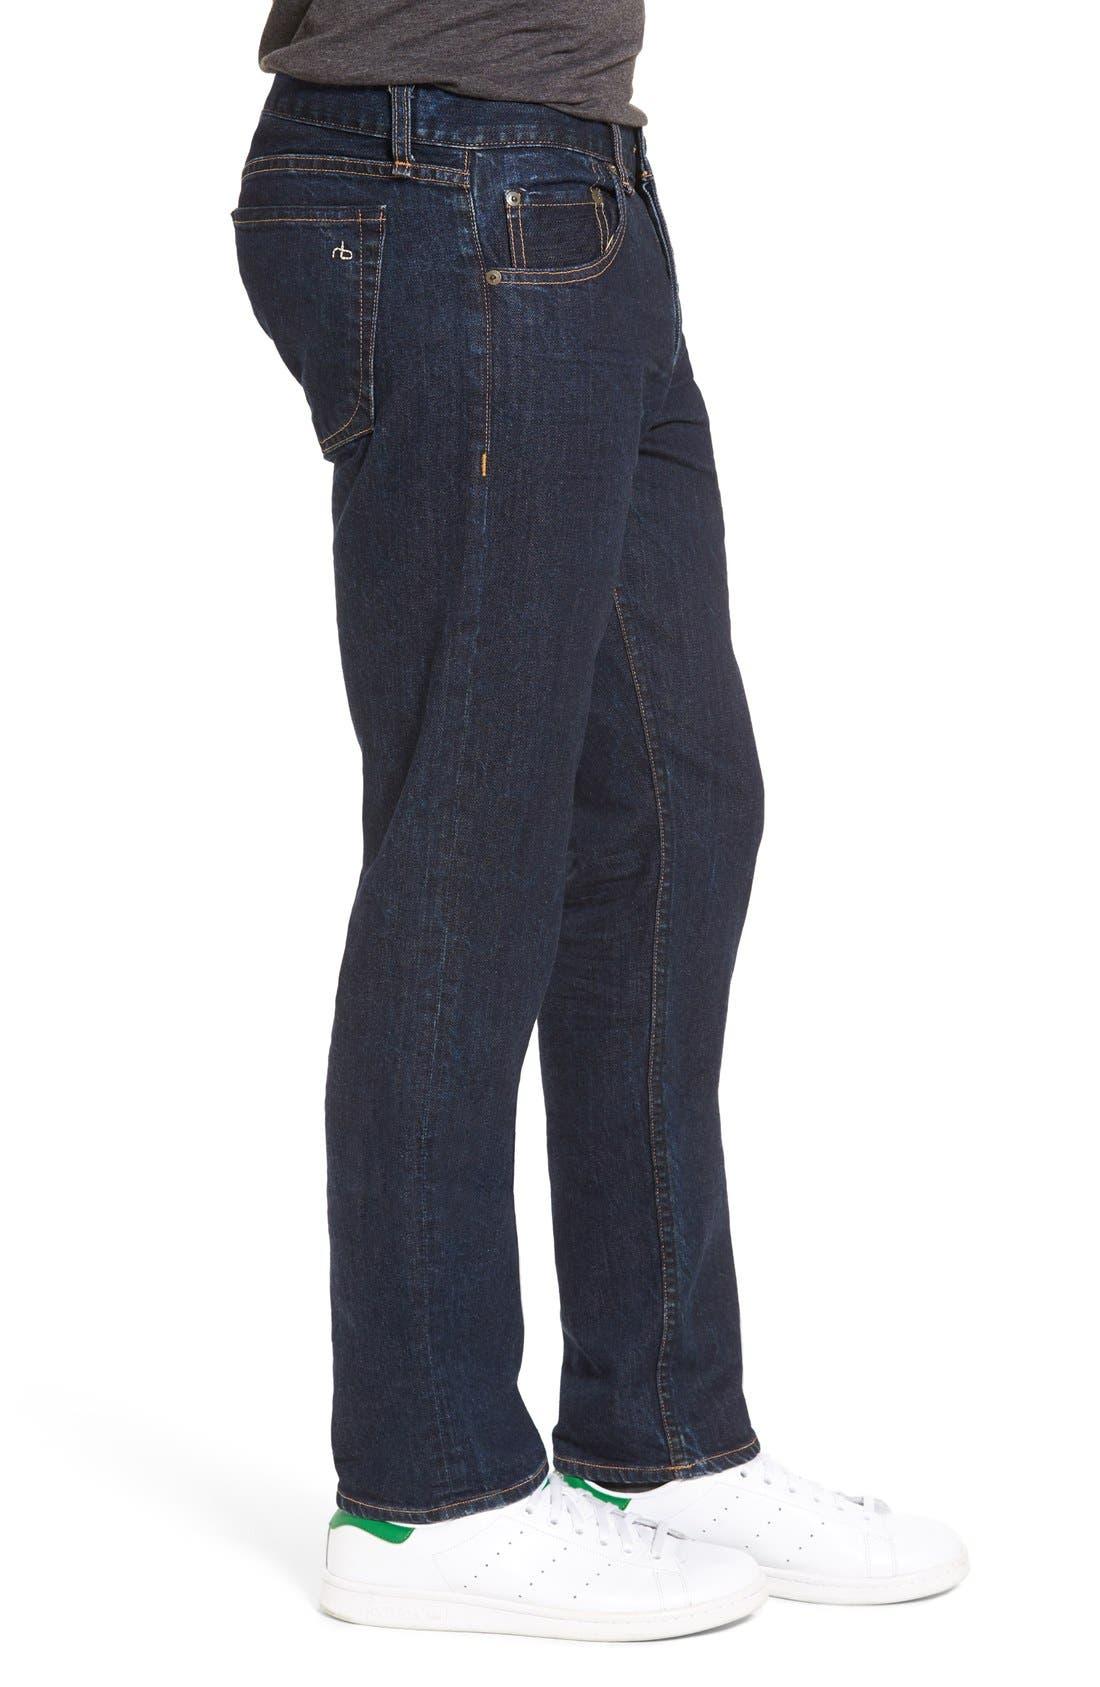 RAG & BONE, Standard Issue Fit 3 Slim Straight Leg Jeans, Alternate thumbnail 10, color, HERITAGE